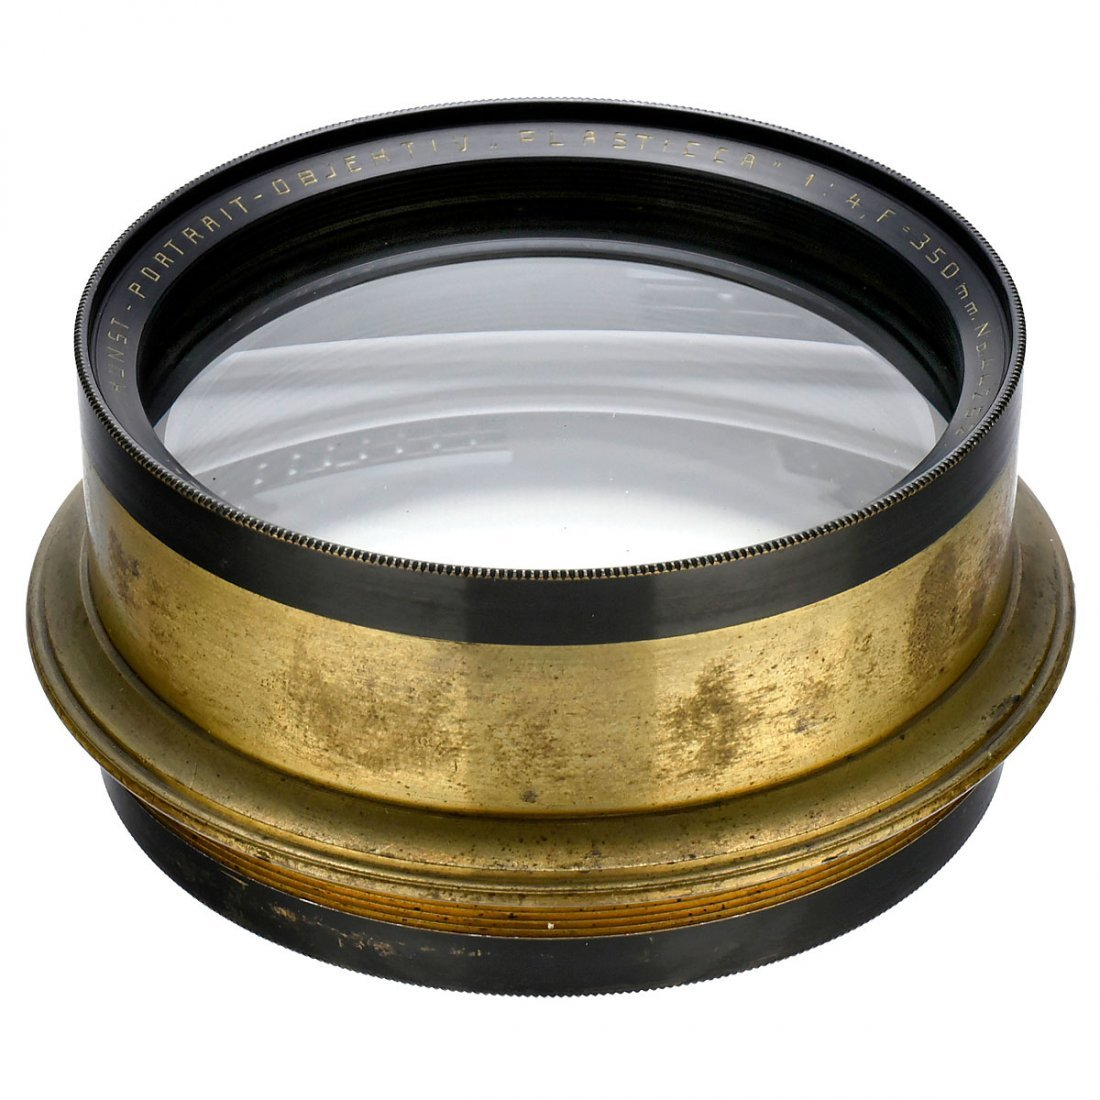 Rare Plasticca 4/350 mm Art Portrait Lens, c. 1920